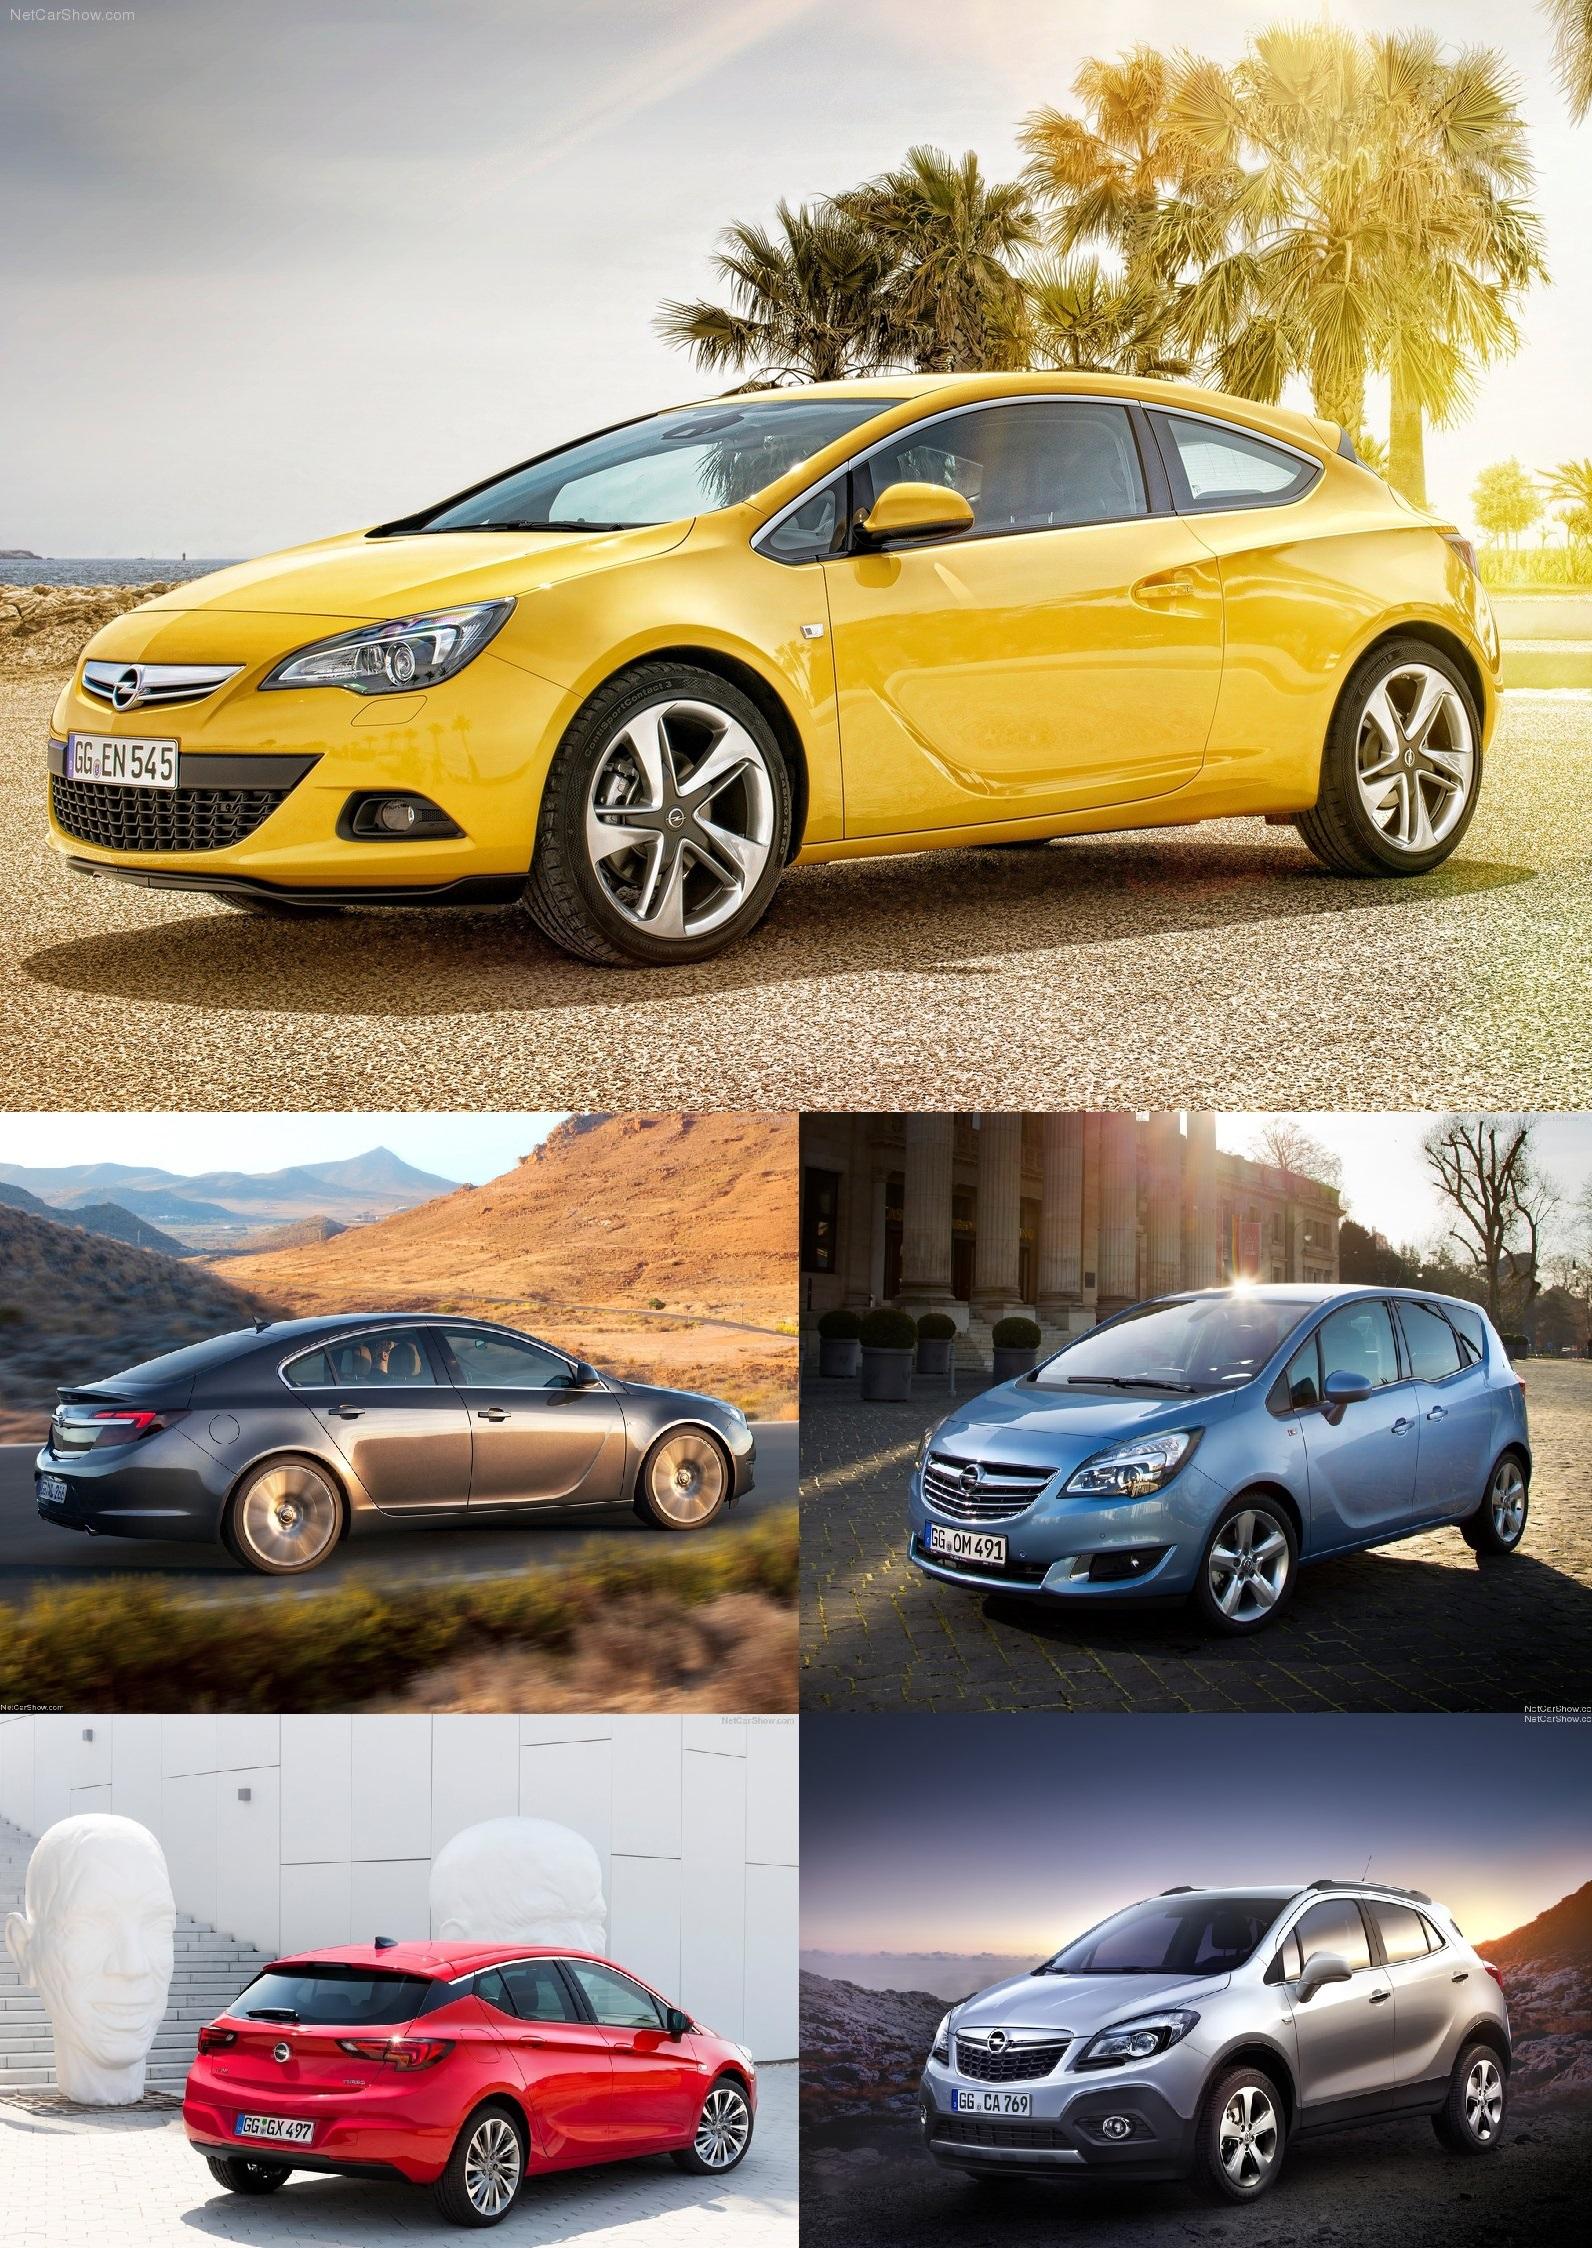 Opel-Astra_GTC_2012_1600x1200_wallpaper_12